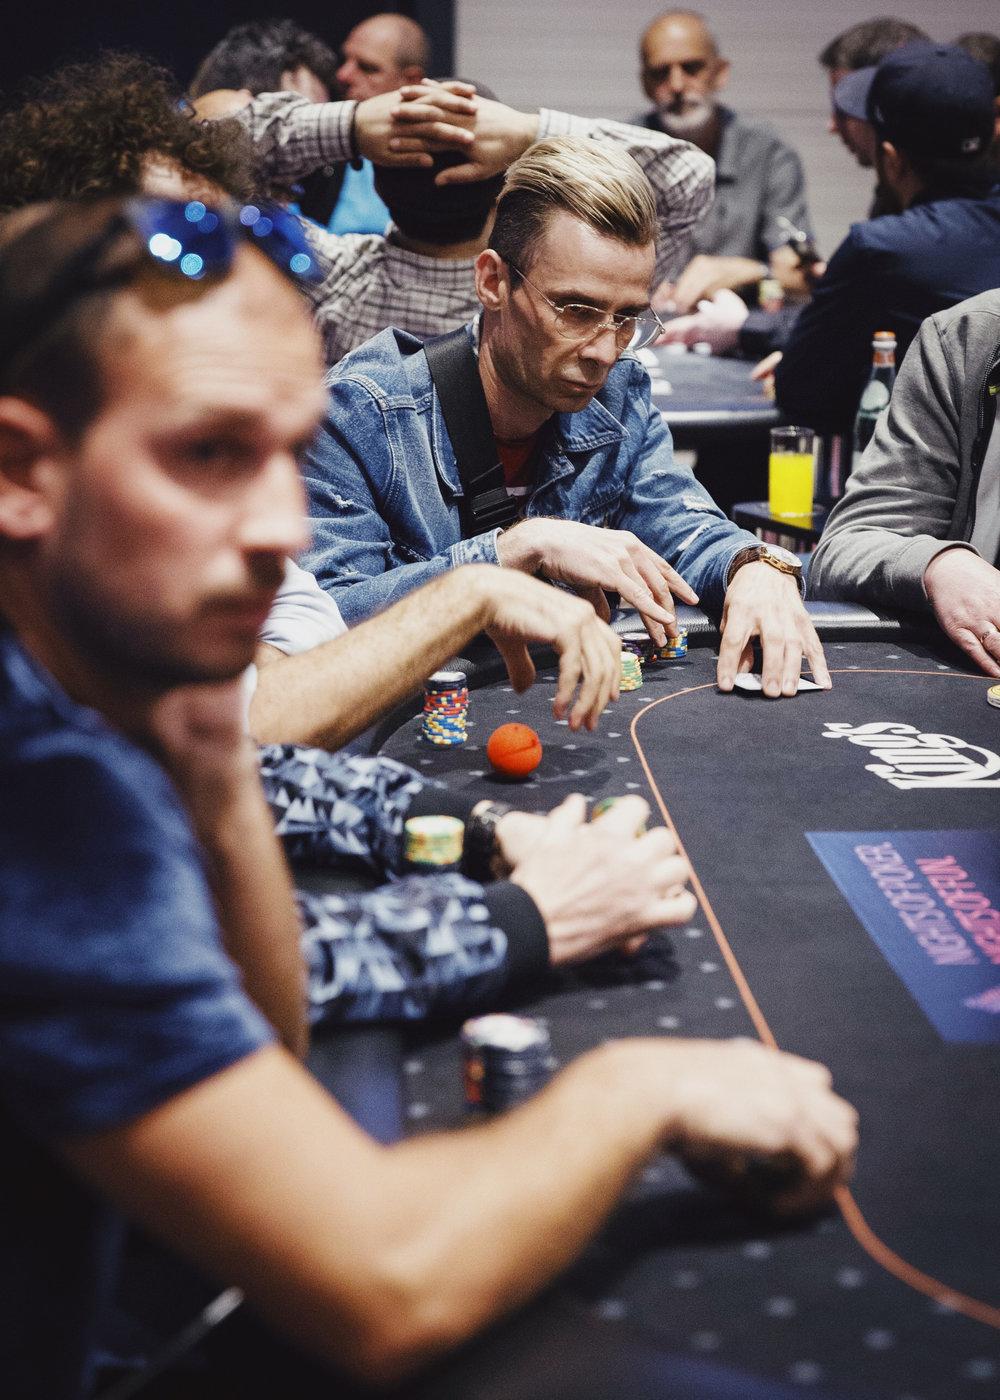 polina-shubkina-poker-011.JPG